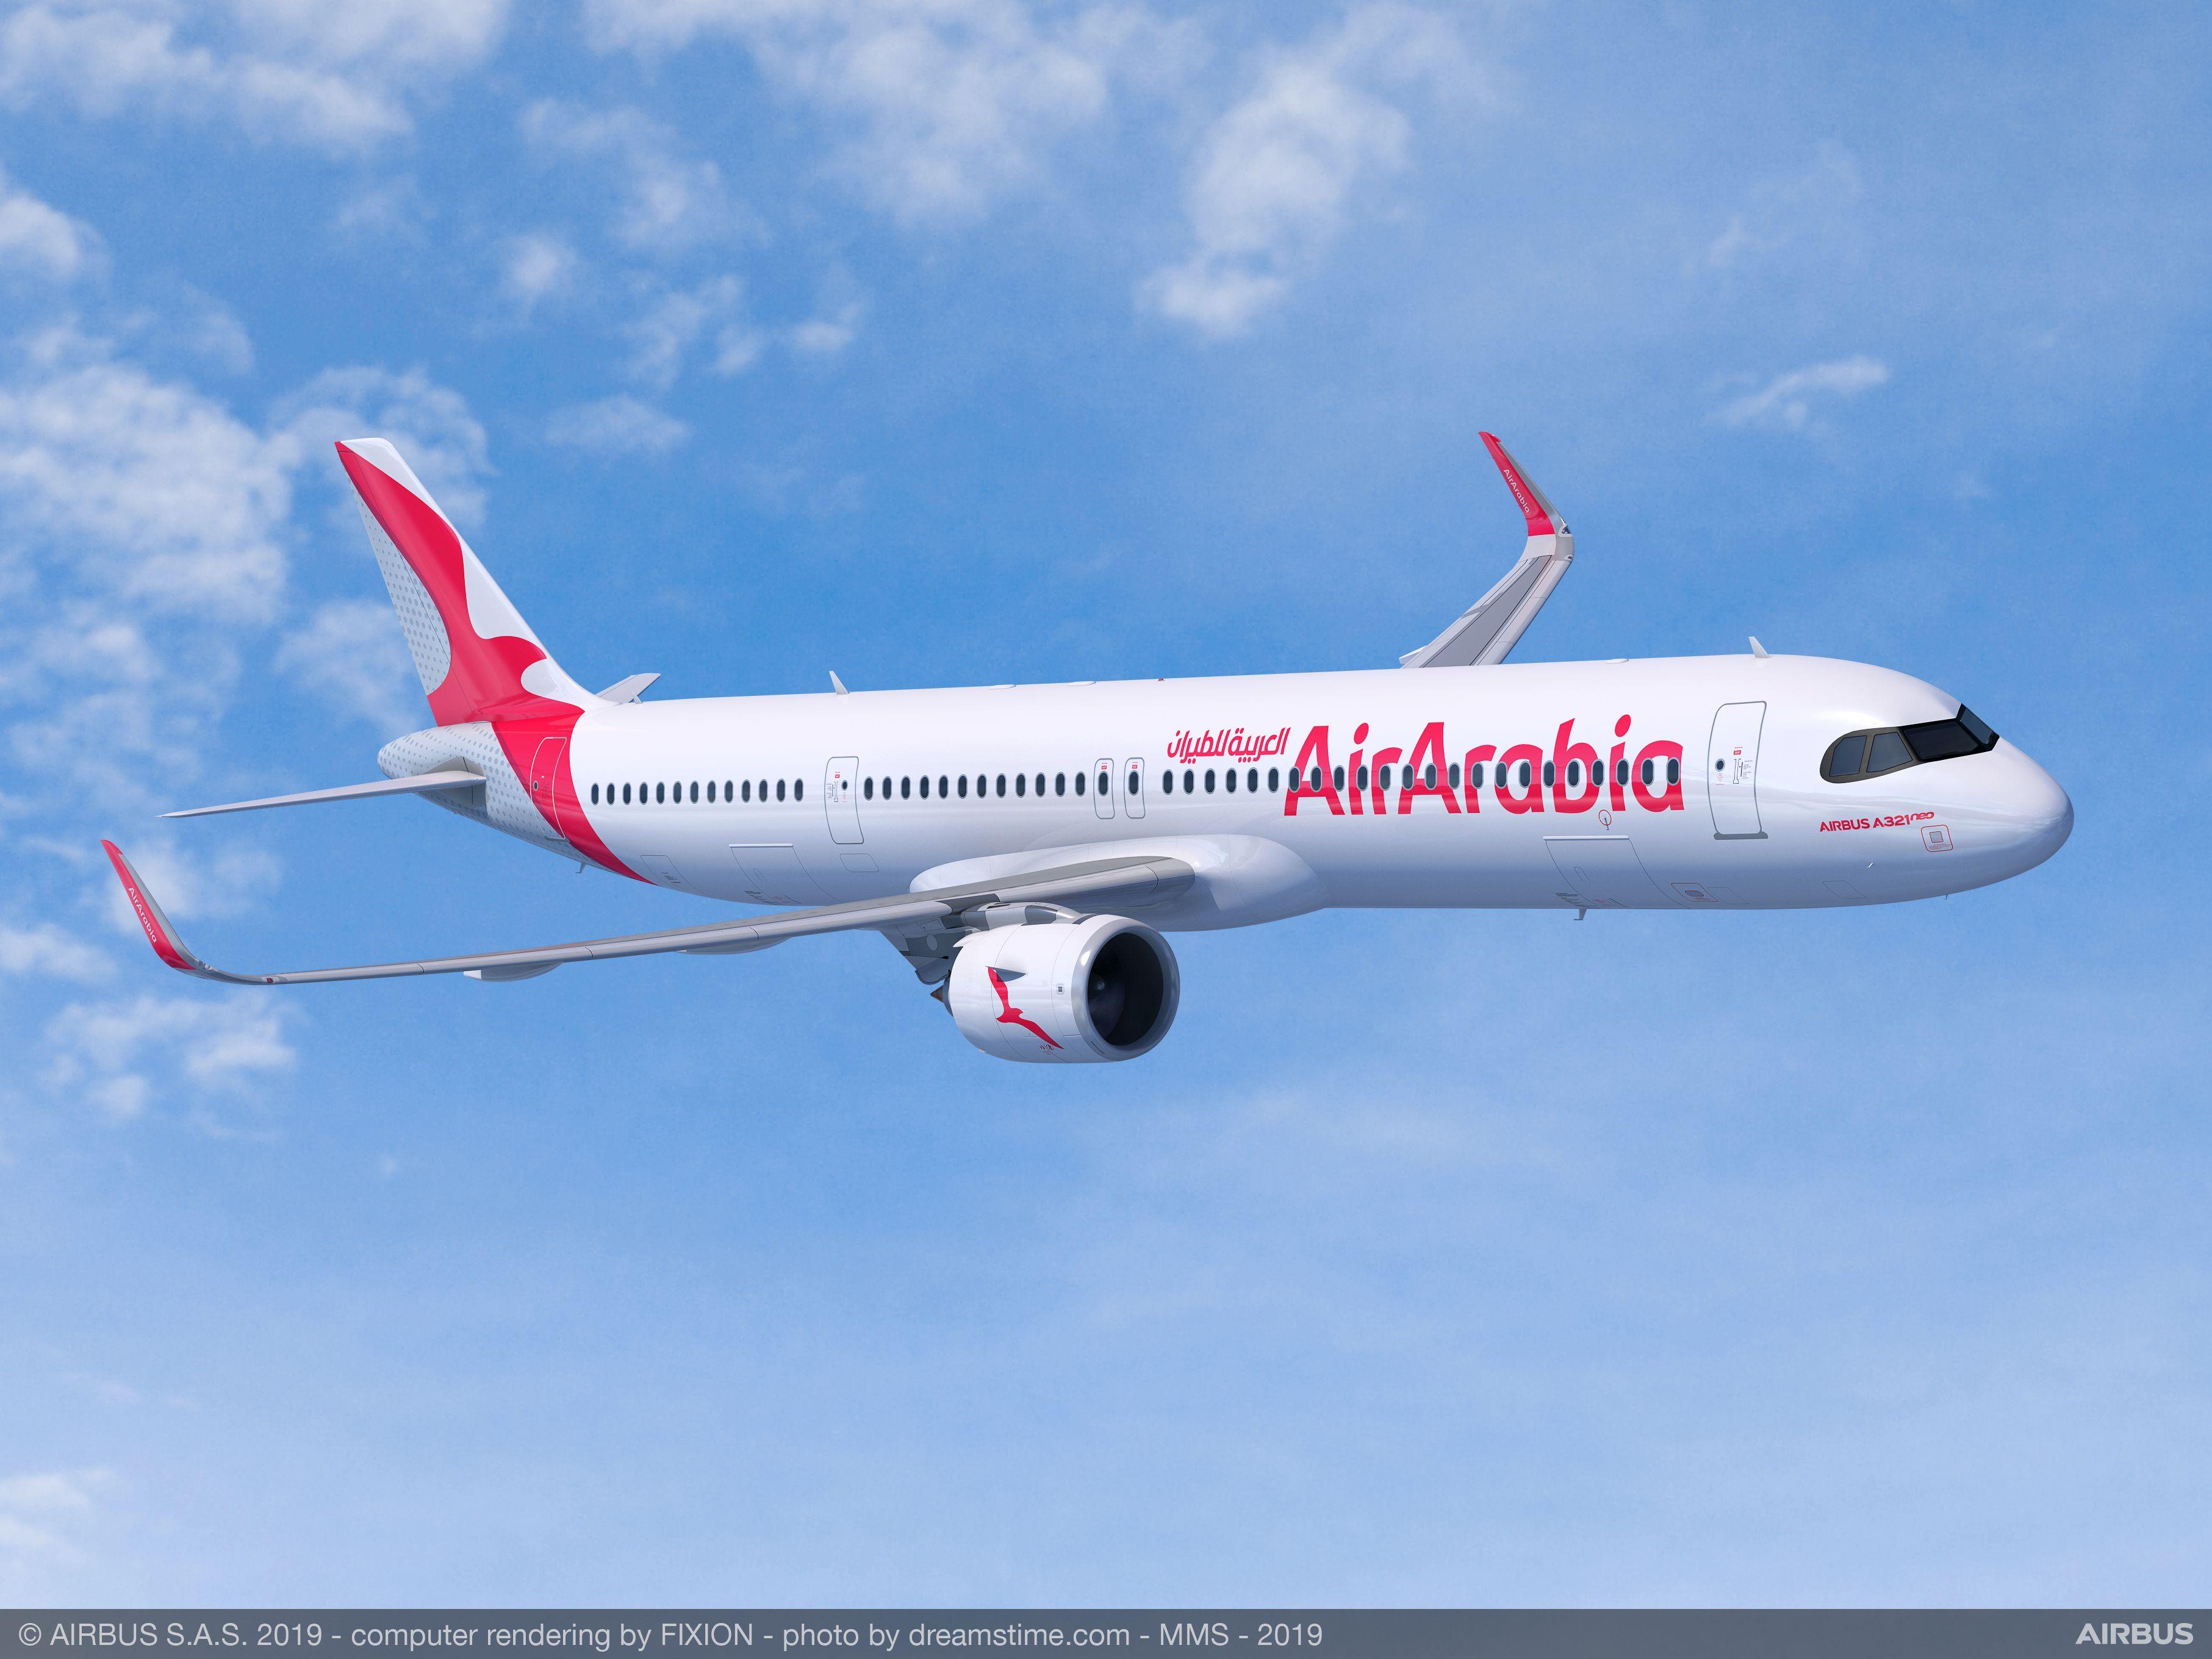 Det mellemøstlige lavprisflyselskab Air Arabia har blandt andet bestilt 20 Airbus A321XLR. Foto: Airbus